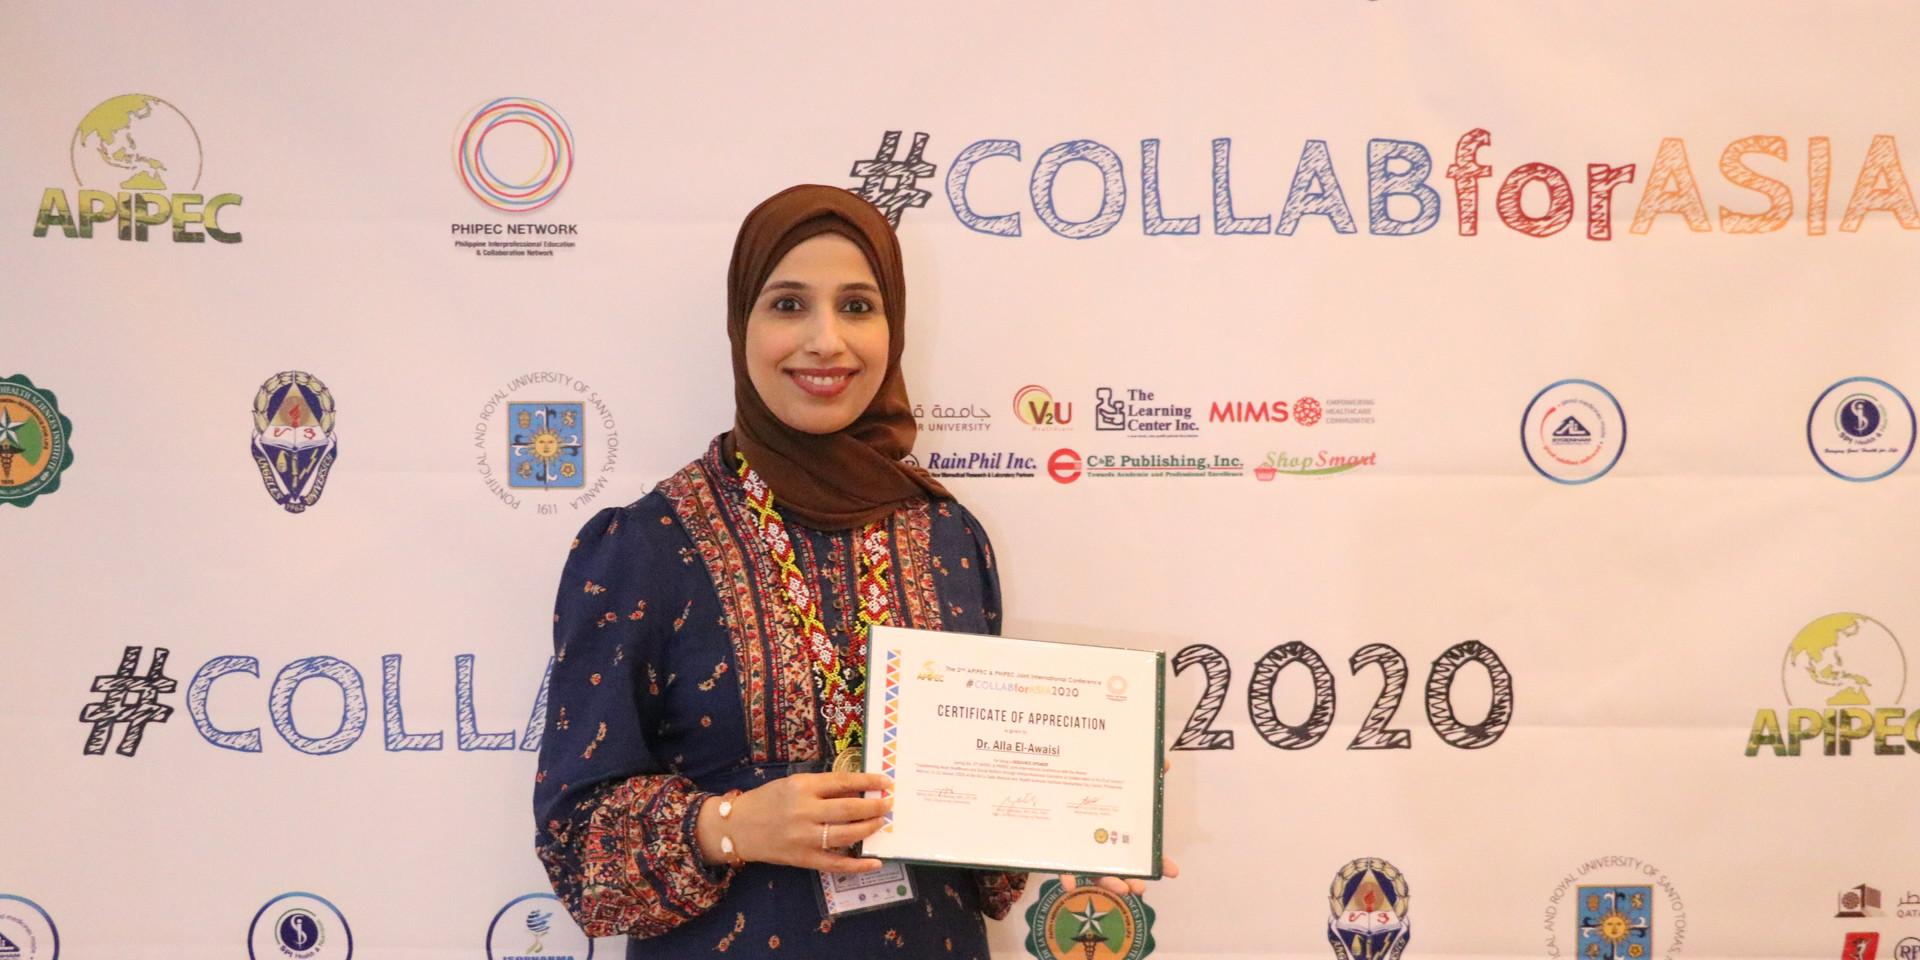 Dr. Alla El-Awaisi as a keynote speaker in C4A